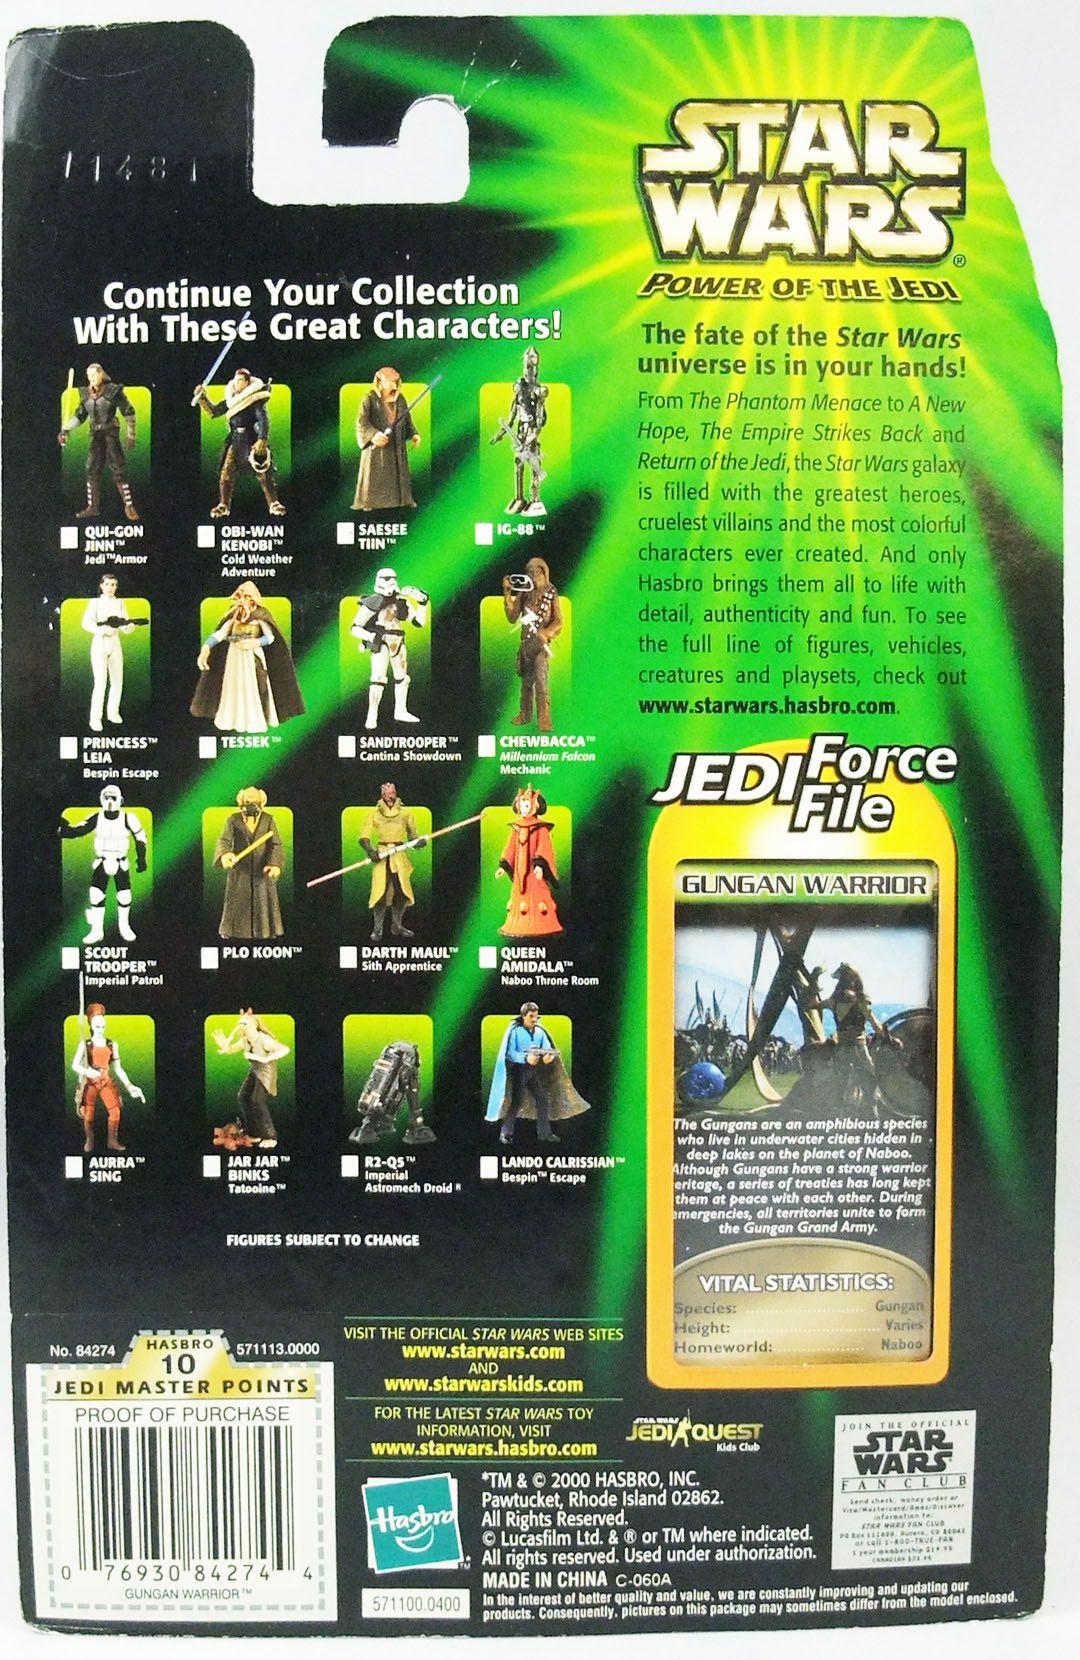 Star Wars (Power of the Jedi) - Hasbro - Gungan Warrior